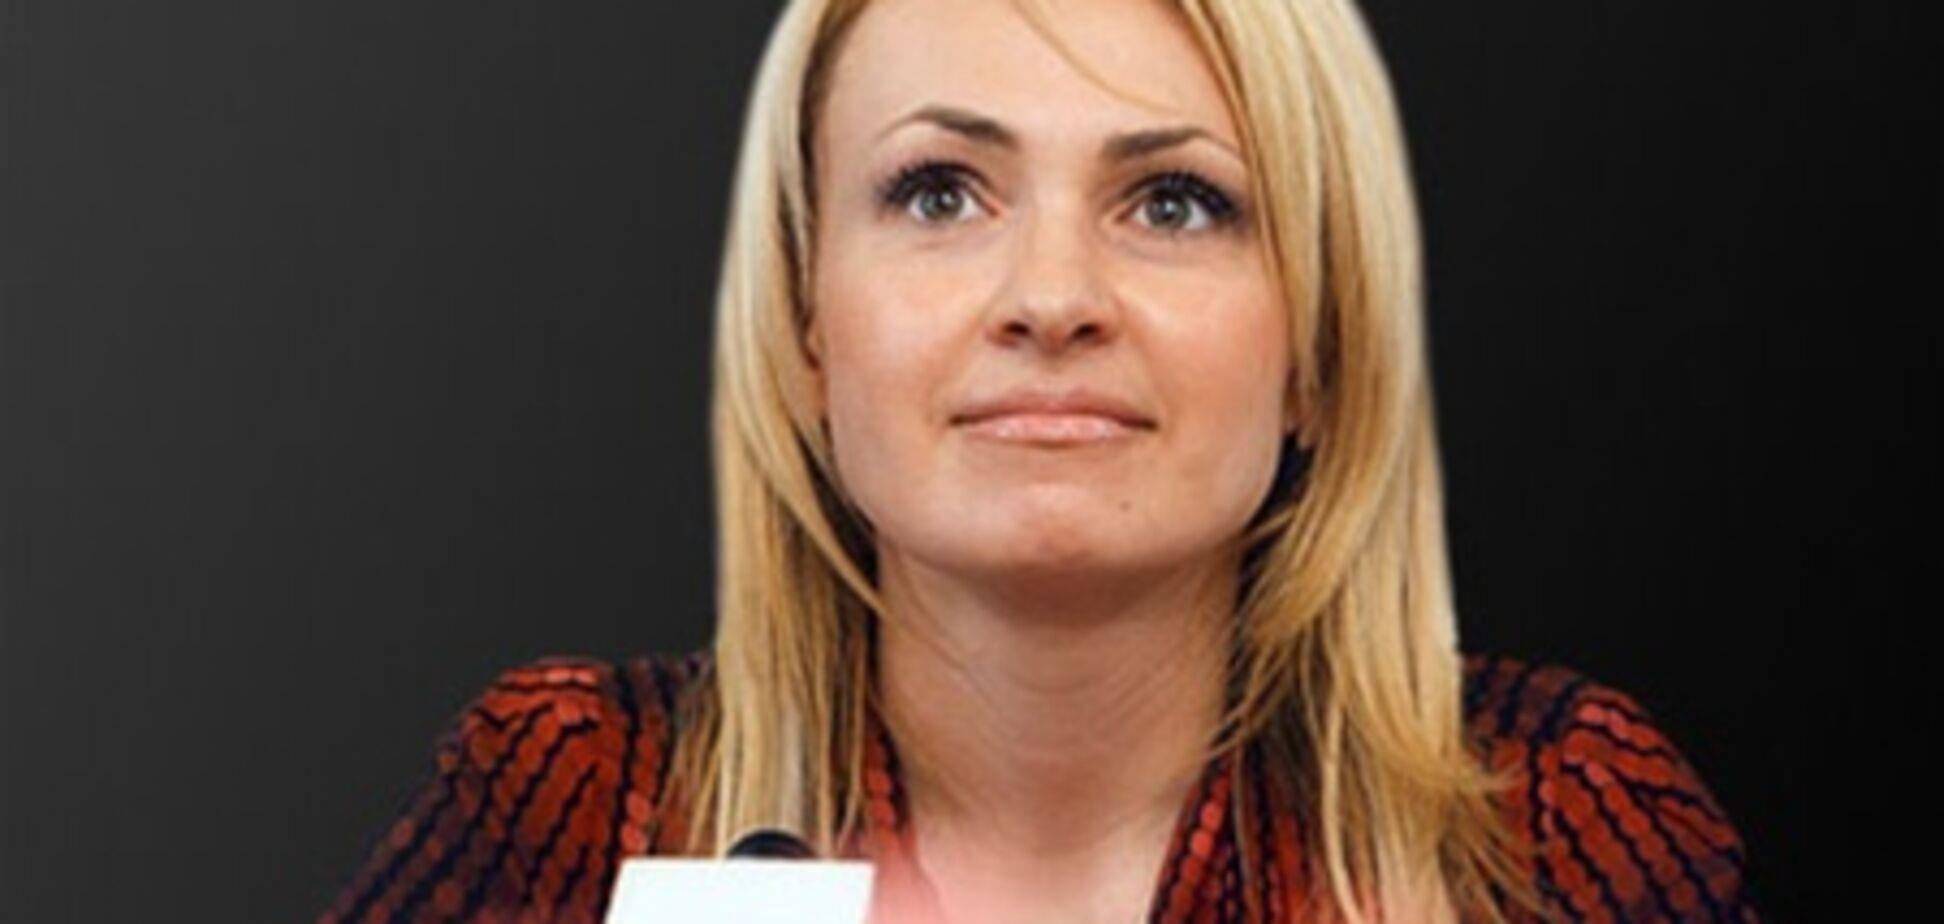 Рудковской за фото ее ребенка предложили $50 тысяч